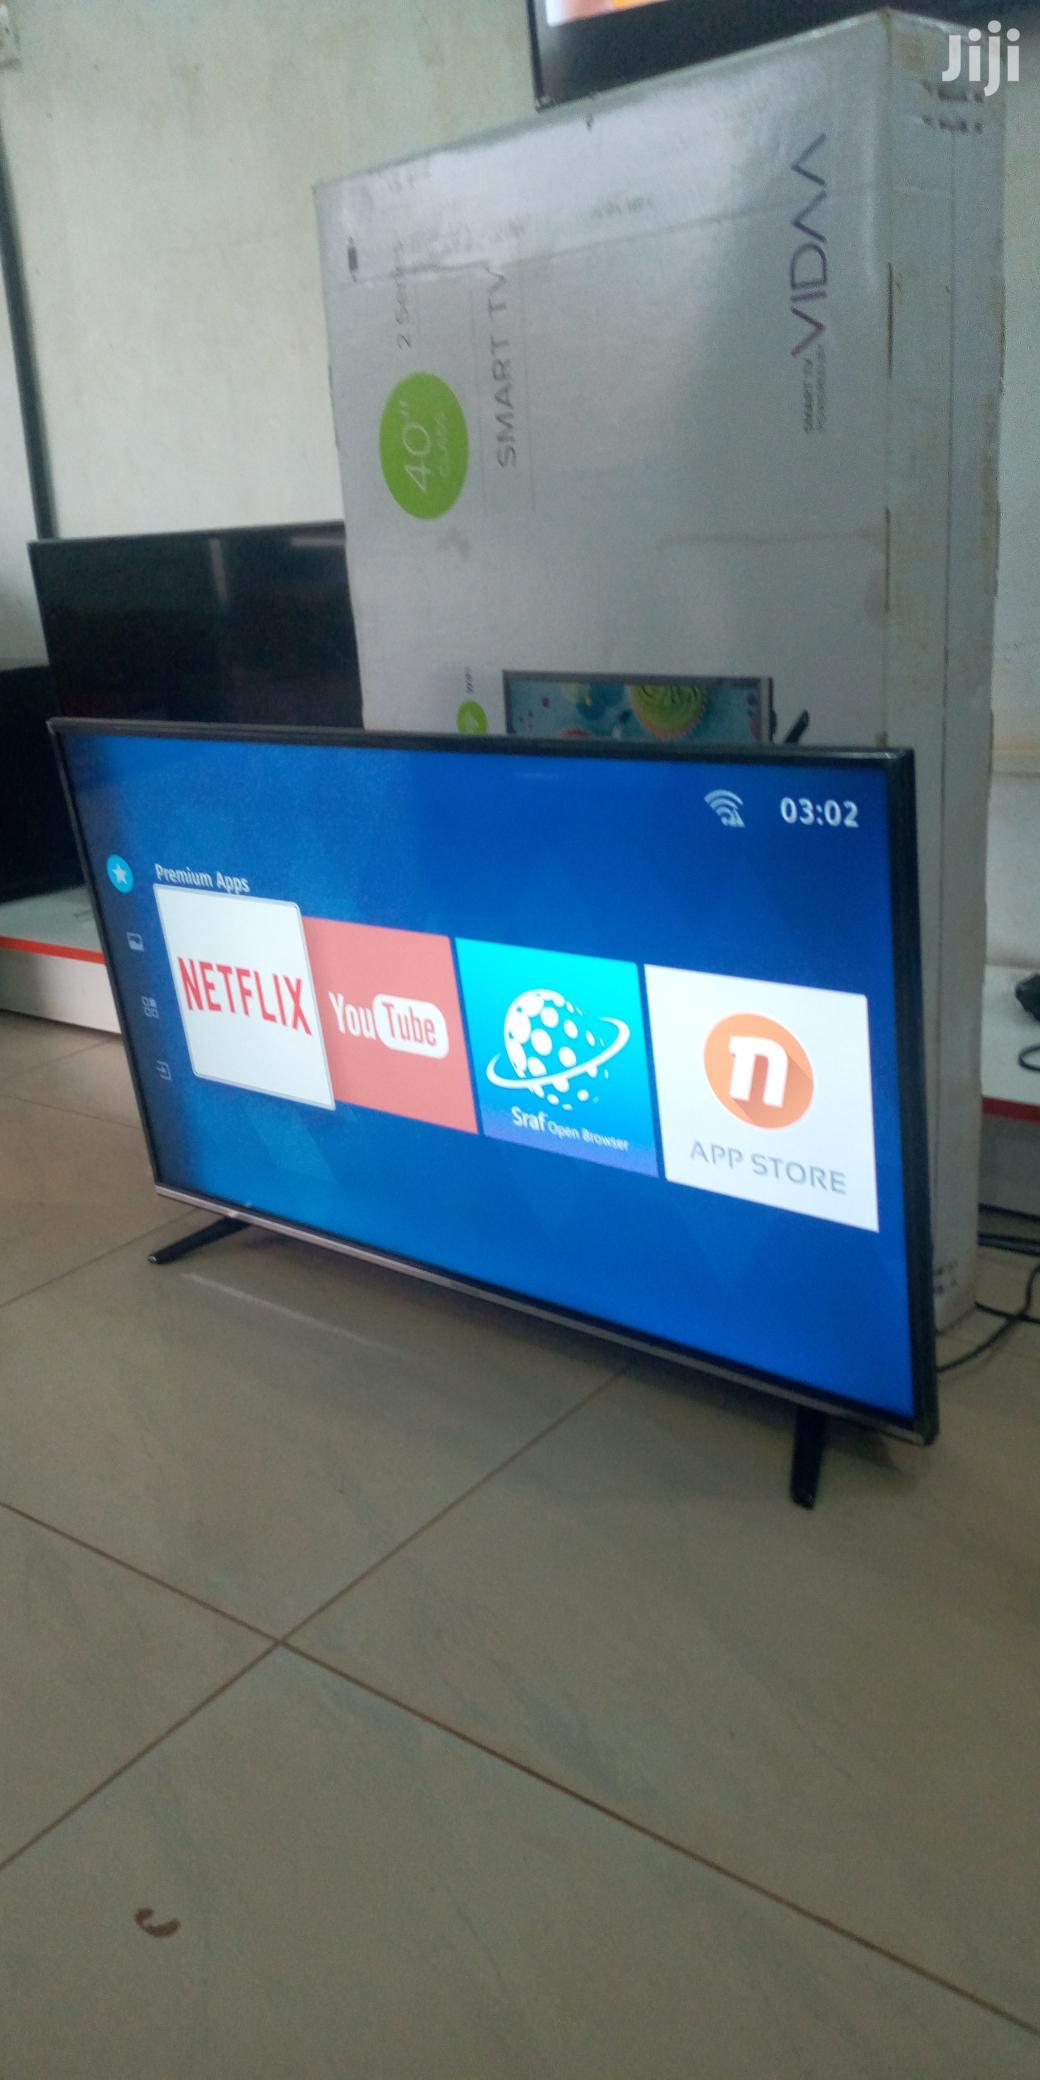 40 Inches Led Hisense Smart Flat Screen Digital   TV & DVD Equipment for sale in Kampala, Central Region, Uganda